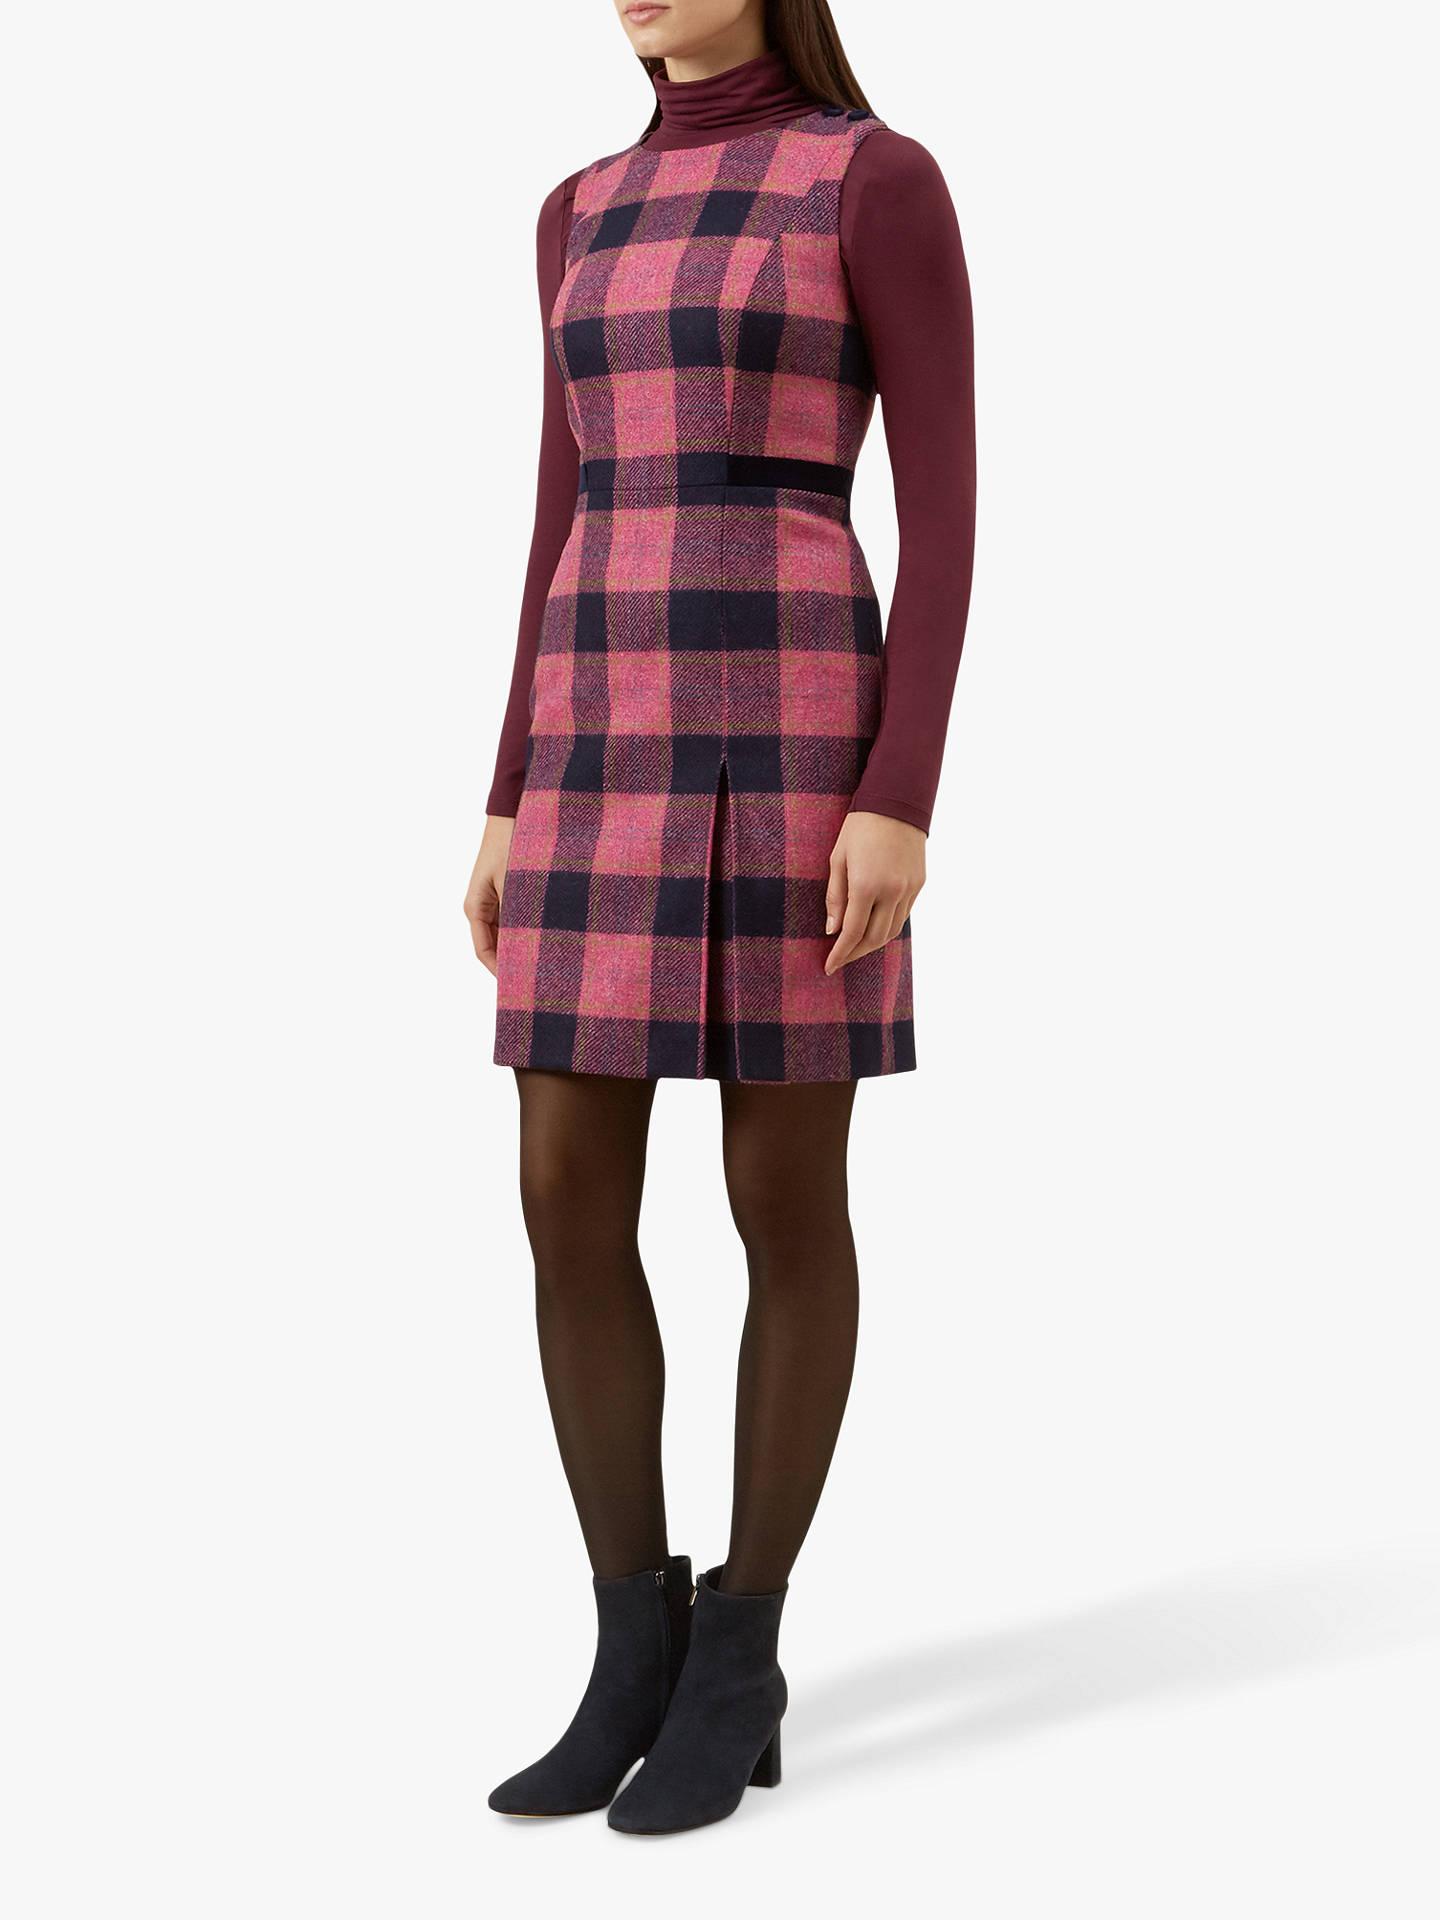 6d2387da930d Buy Hobbs Avery Wool Dress, Pink/Multi, 18 Online at johnlewis.com ...